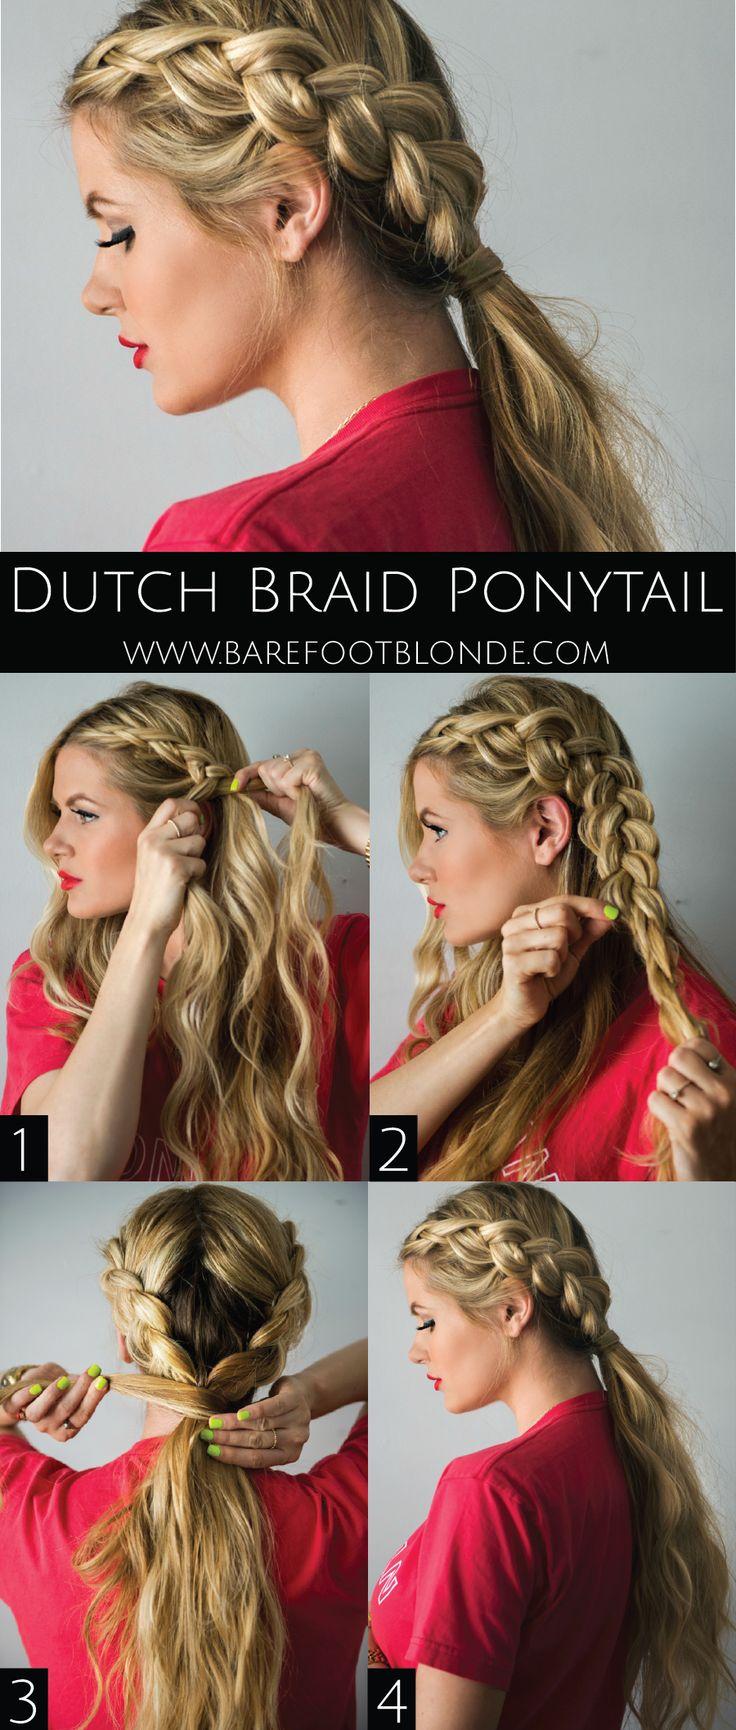 Dutch Braid Ponytail Tutorial